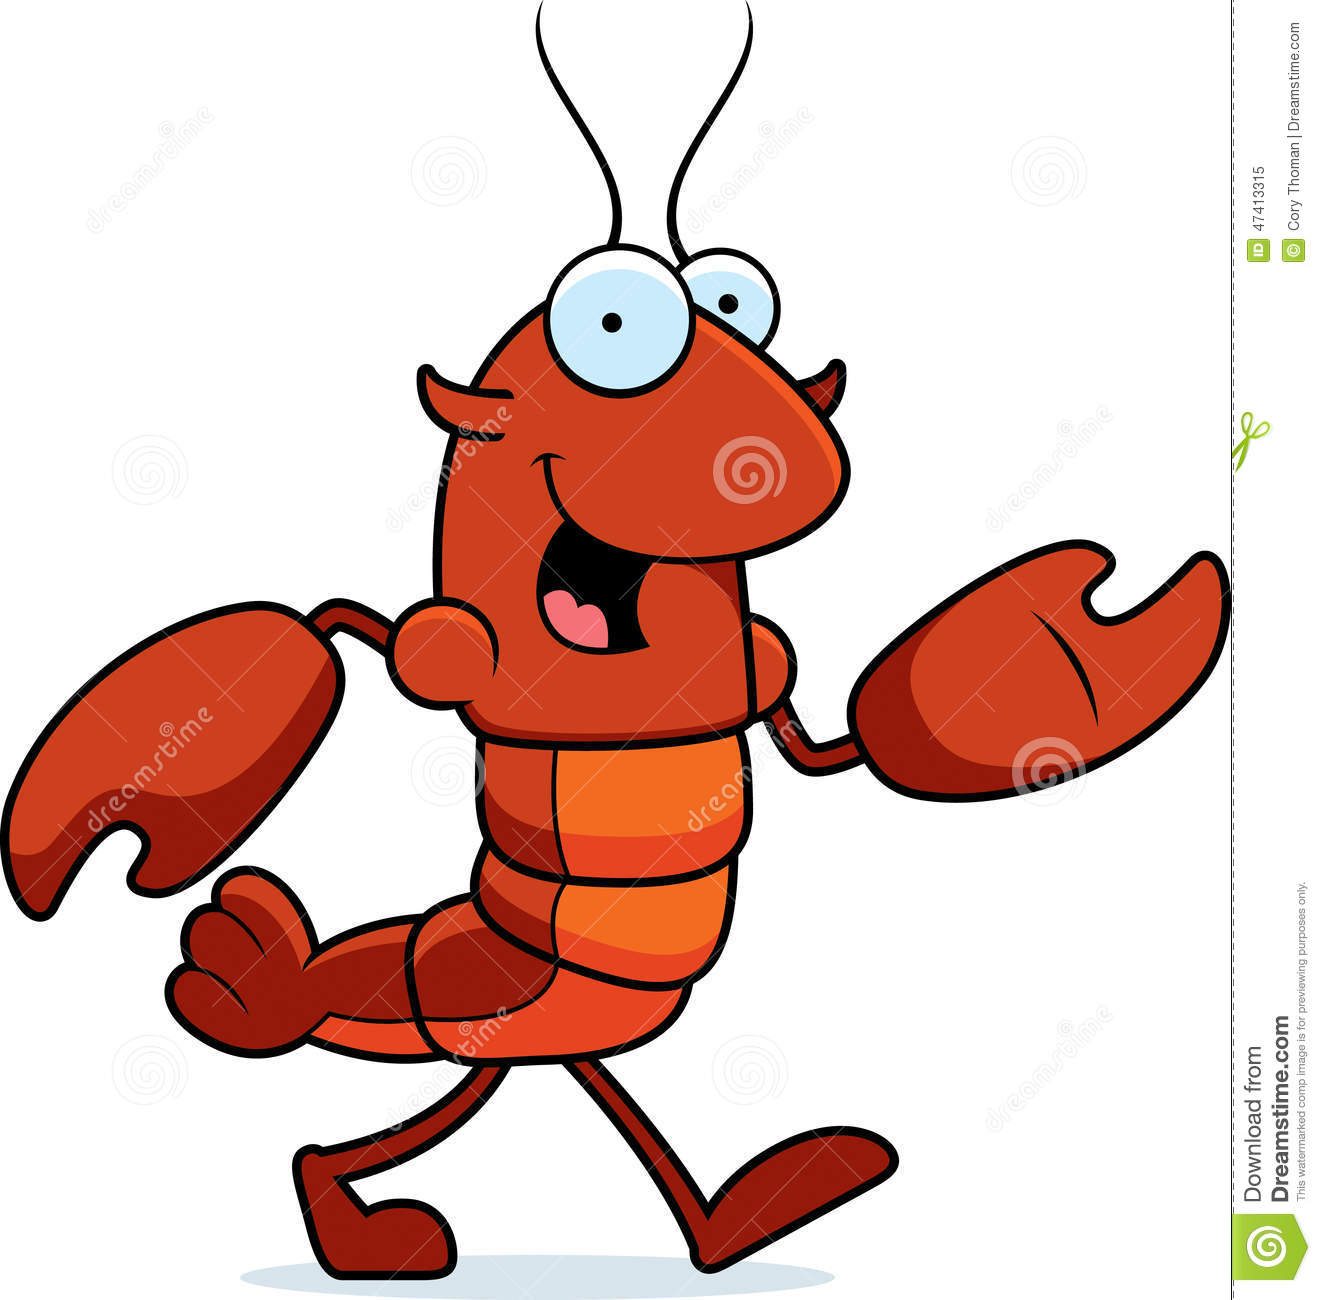 Crayfish clipart Clipart clipart Crayfish collection crayfish